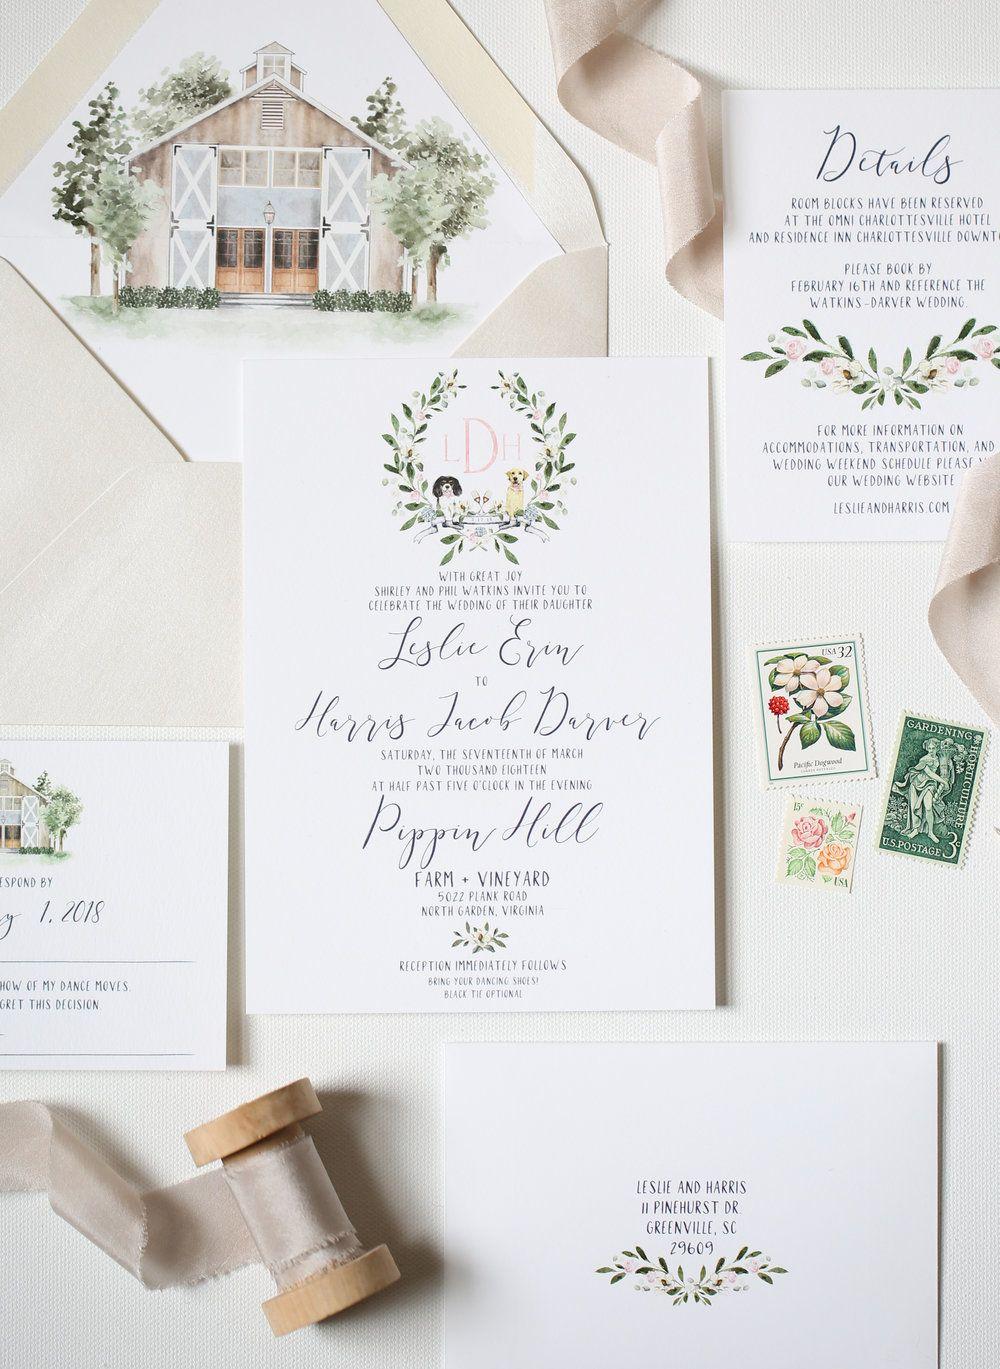 Custom Wedding Invitation Suite of Pippin Hill Farm by Emily Mayne ...